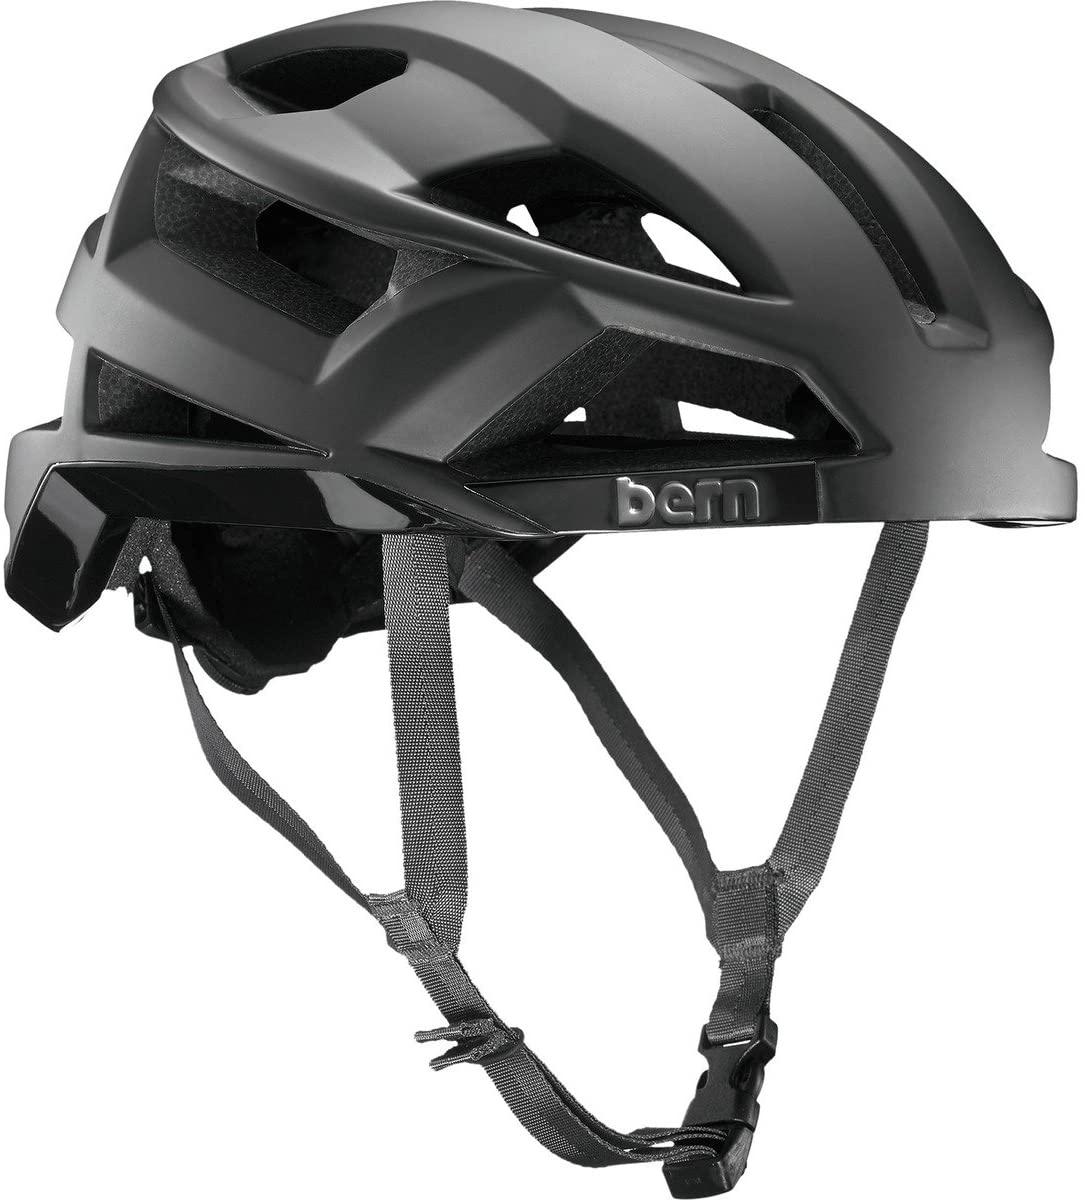 BERN Bike FL-1 Pave MIPS Helmet - Men's Matte Black Small